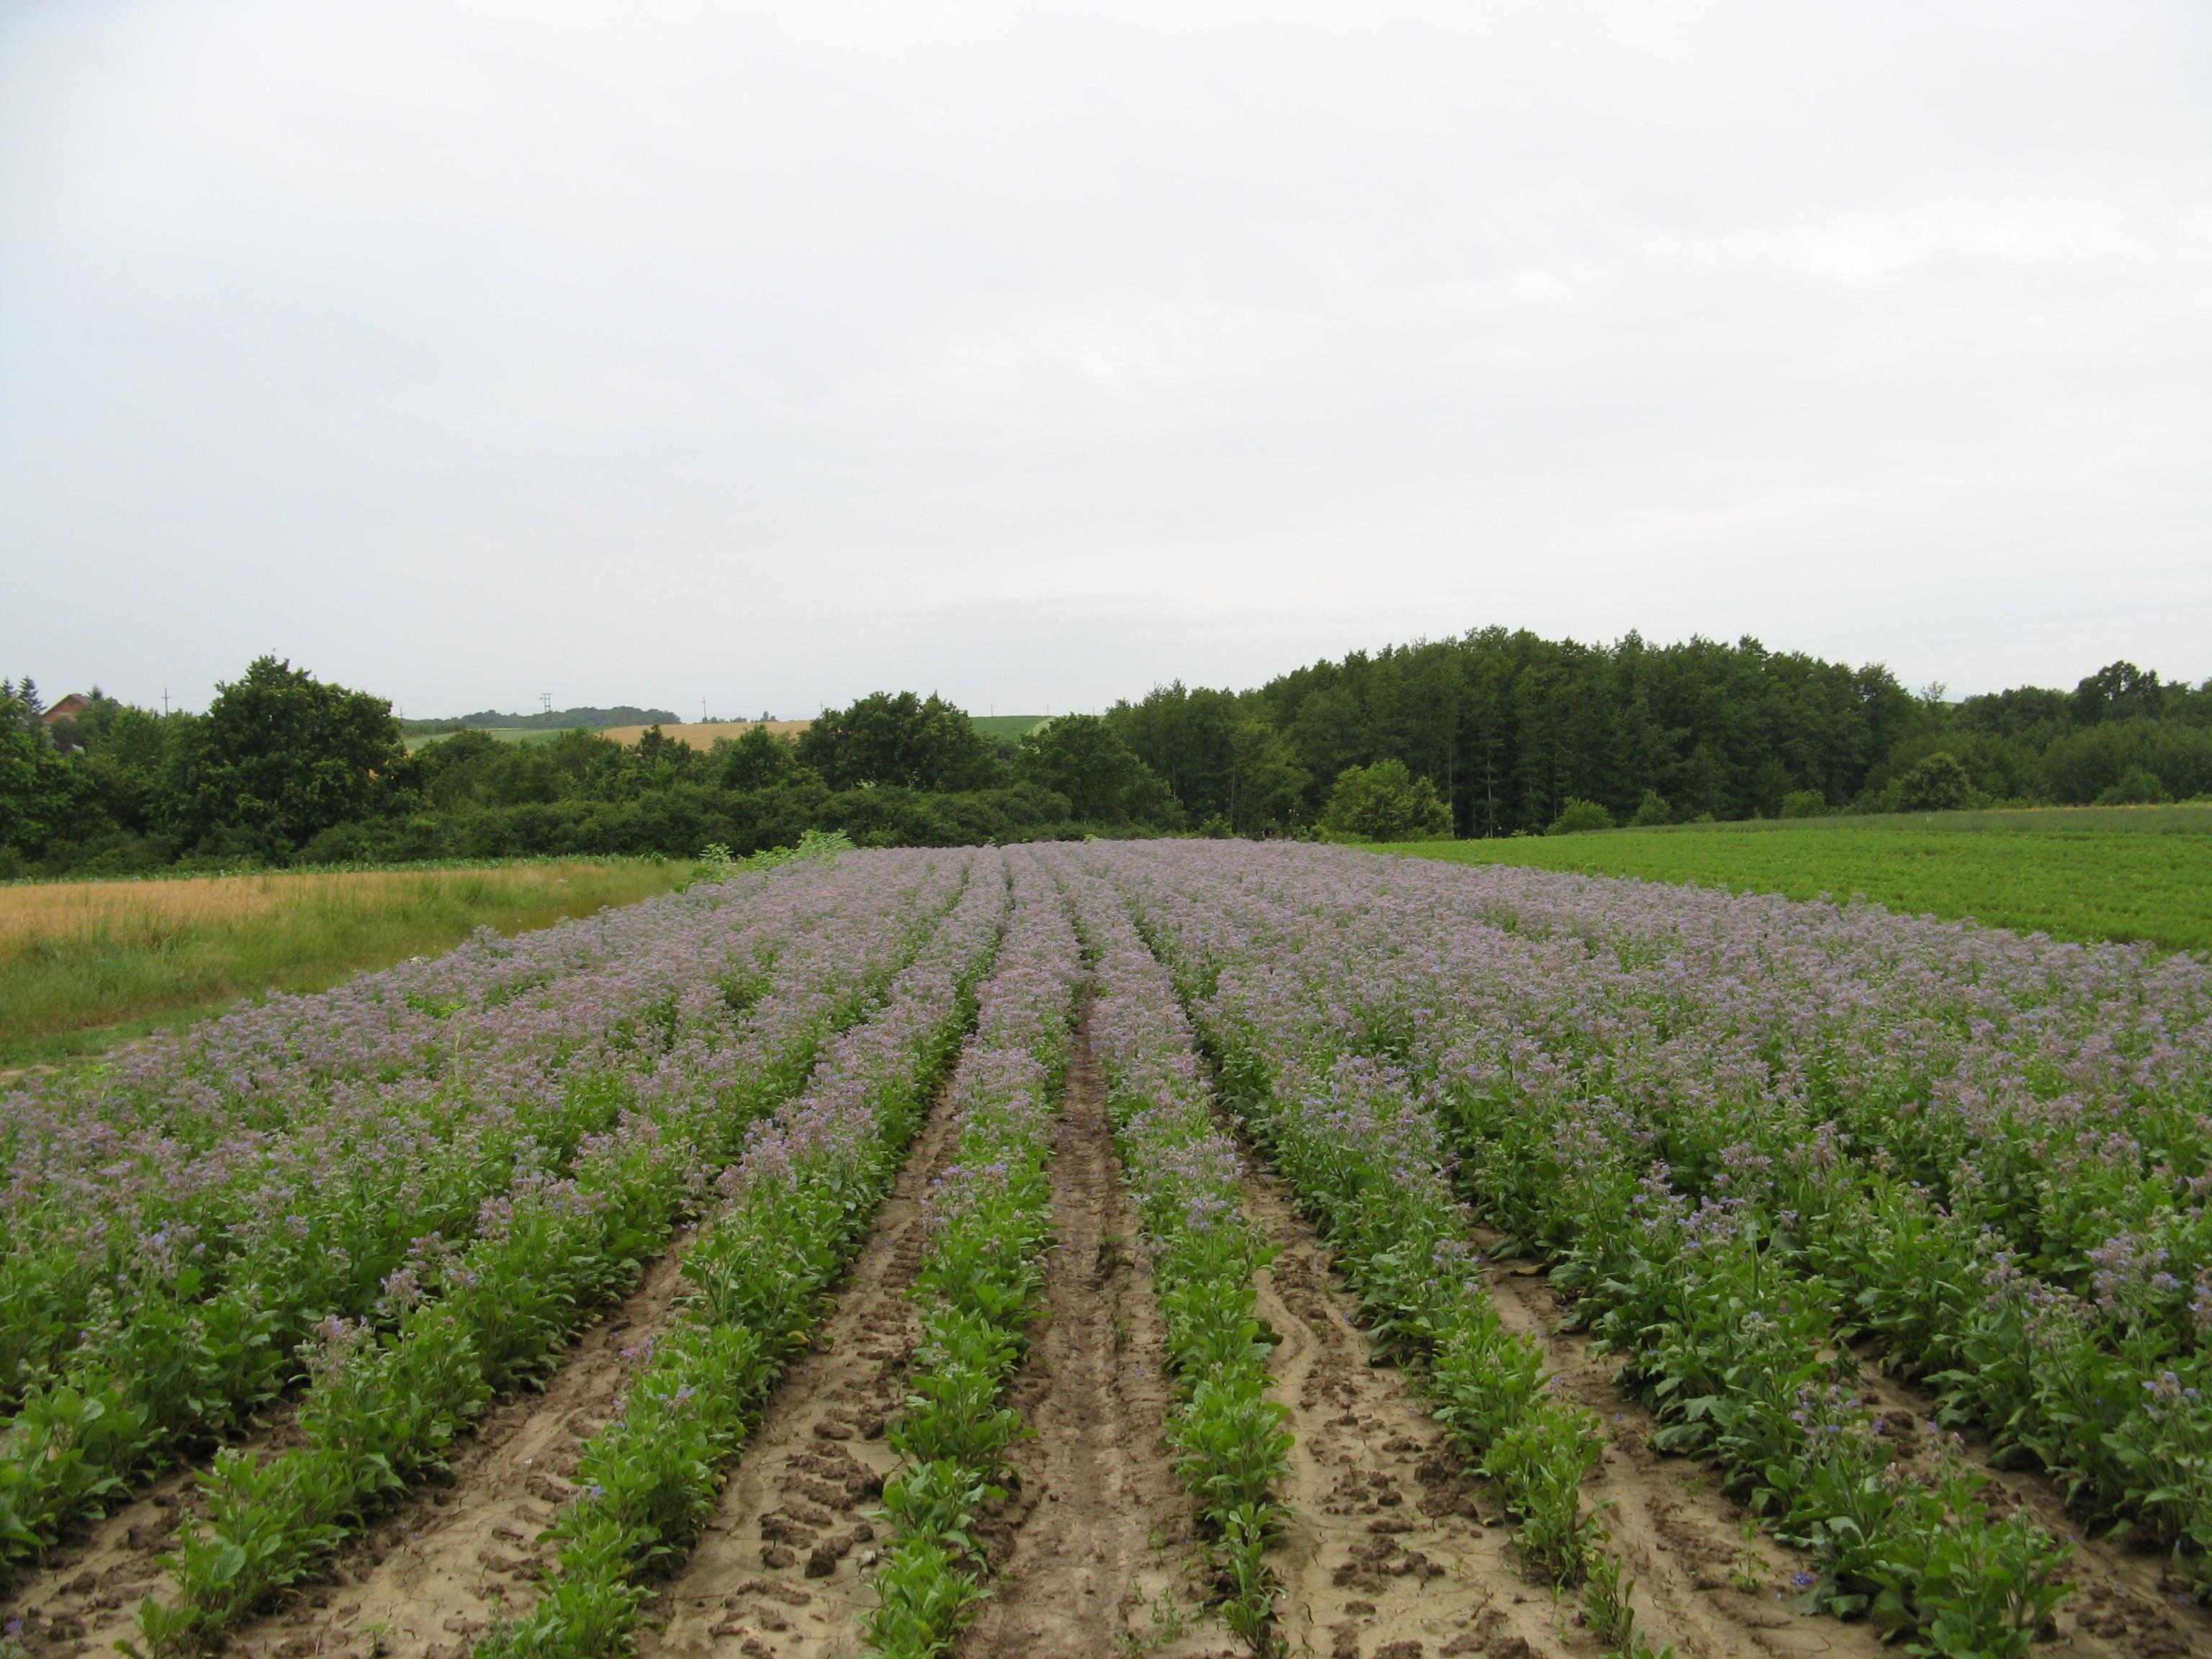 Cultivated farm plot in Croatia